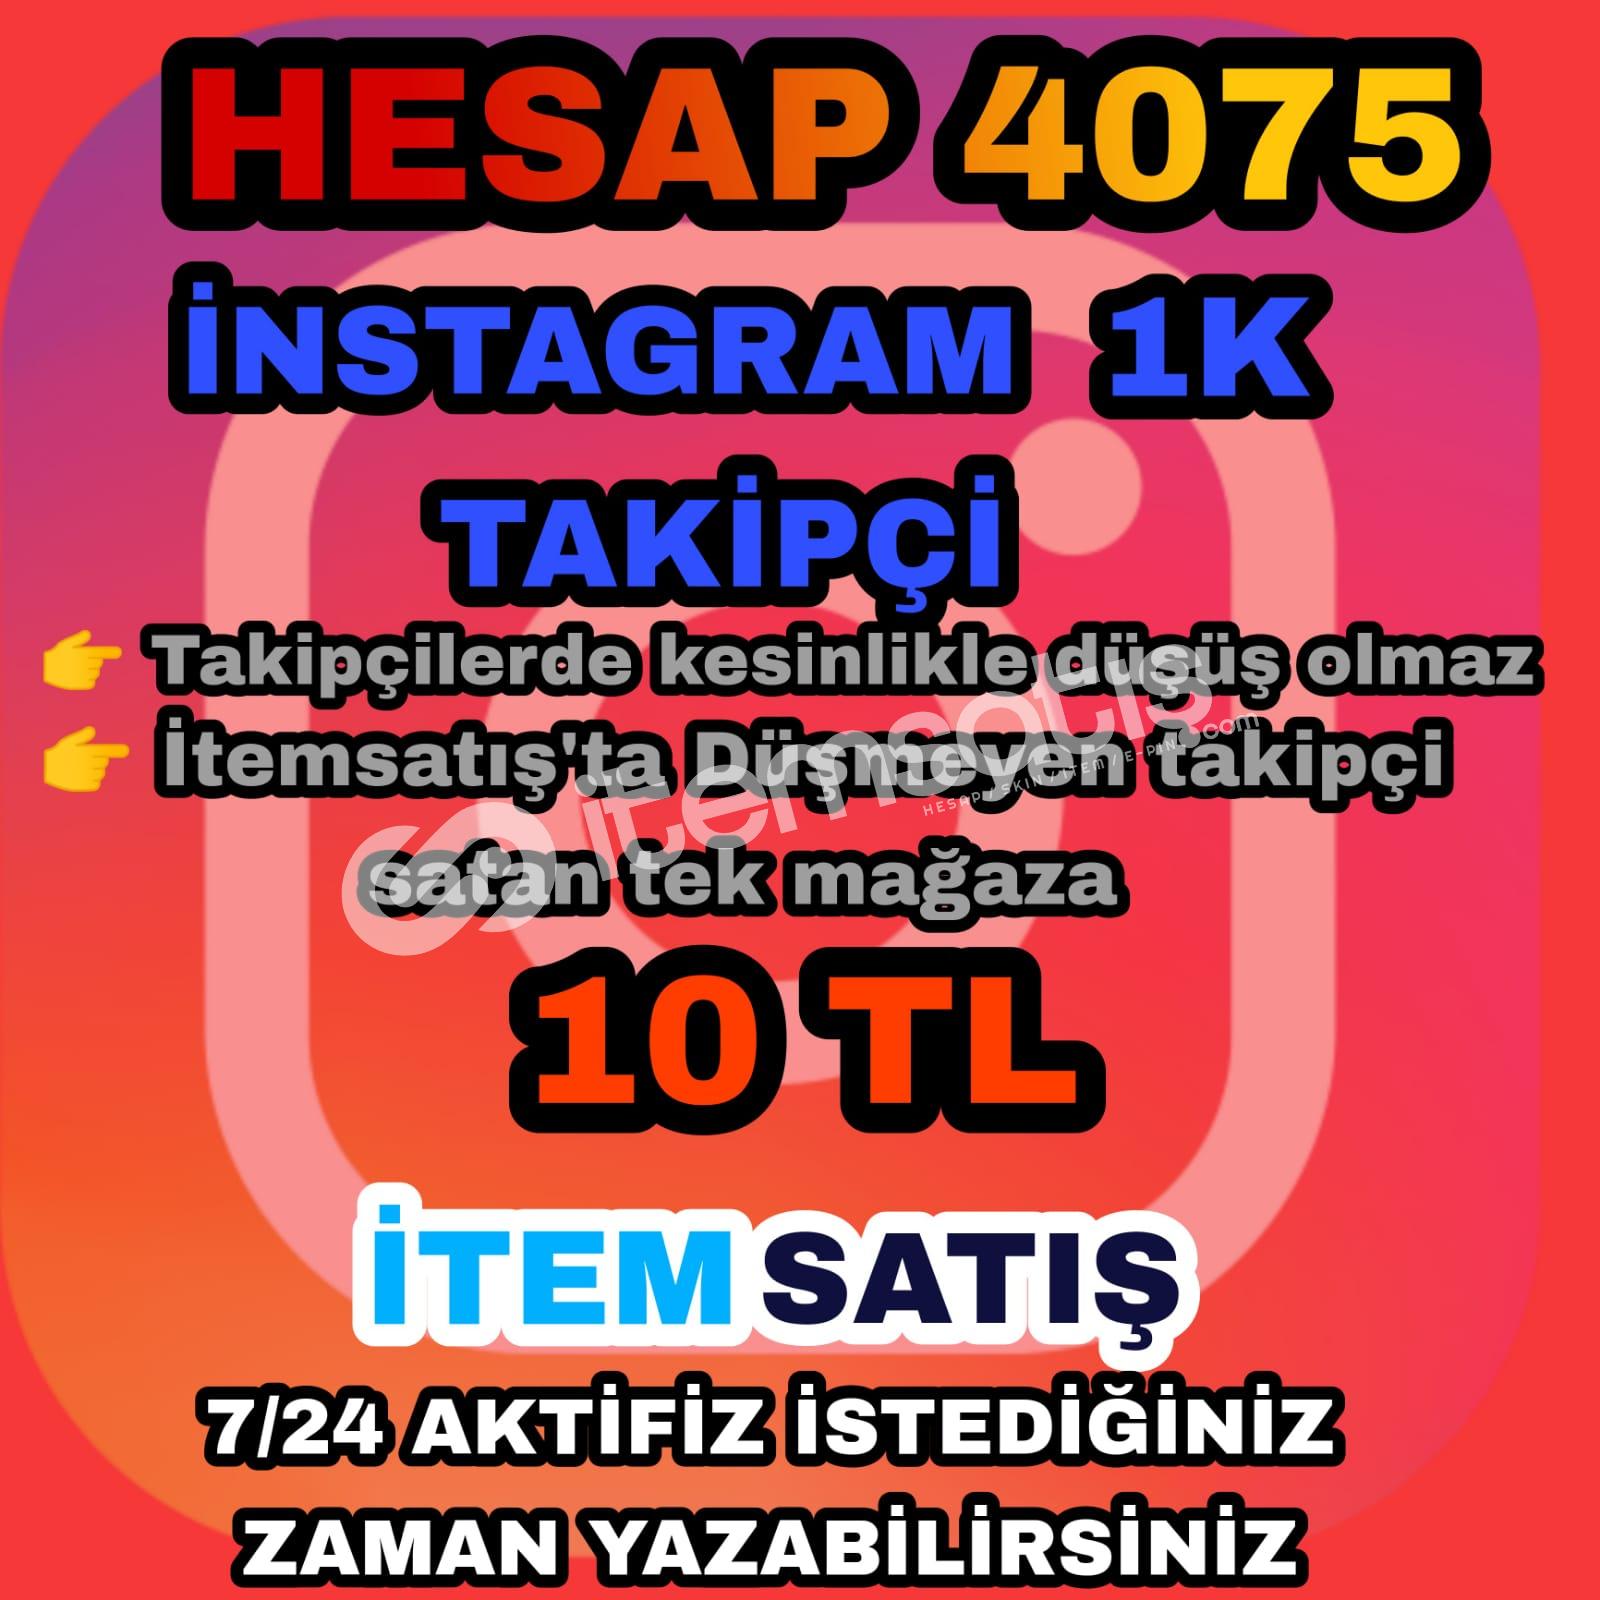 İnstegram 1K takipçi